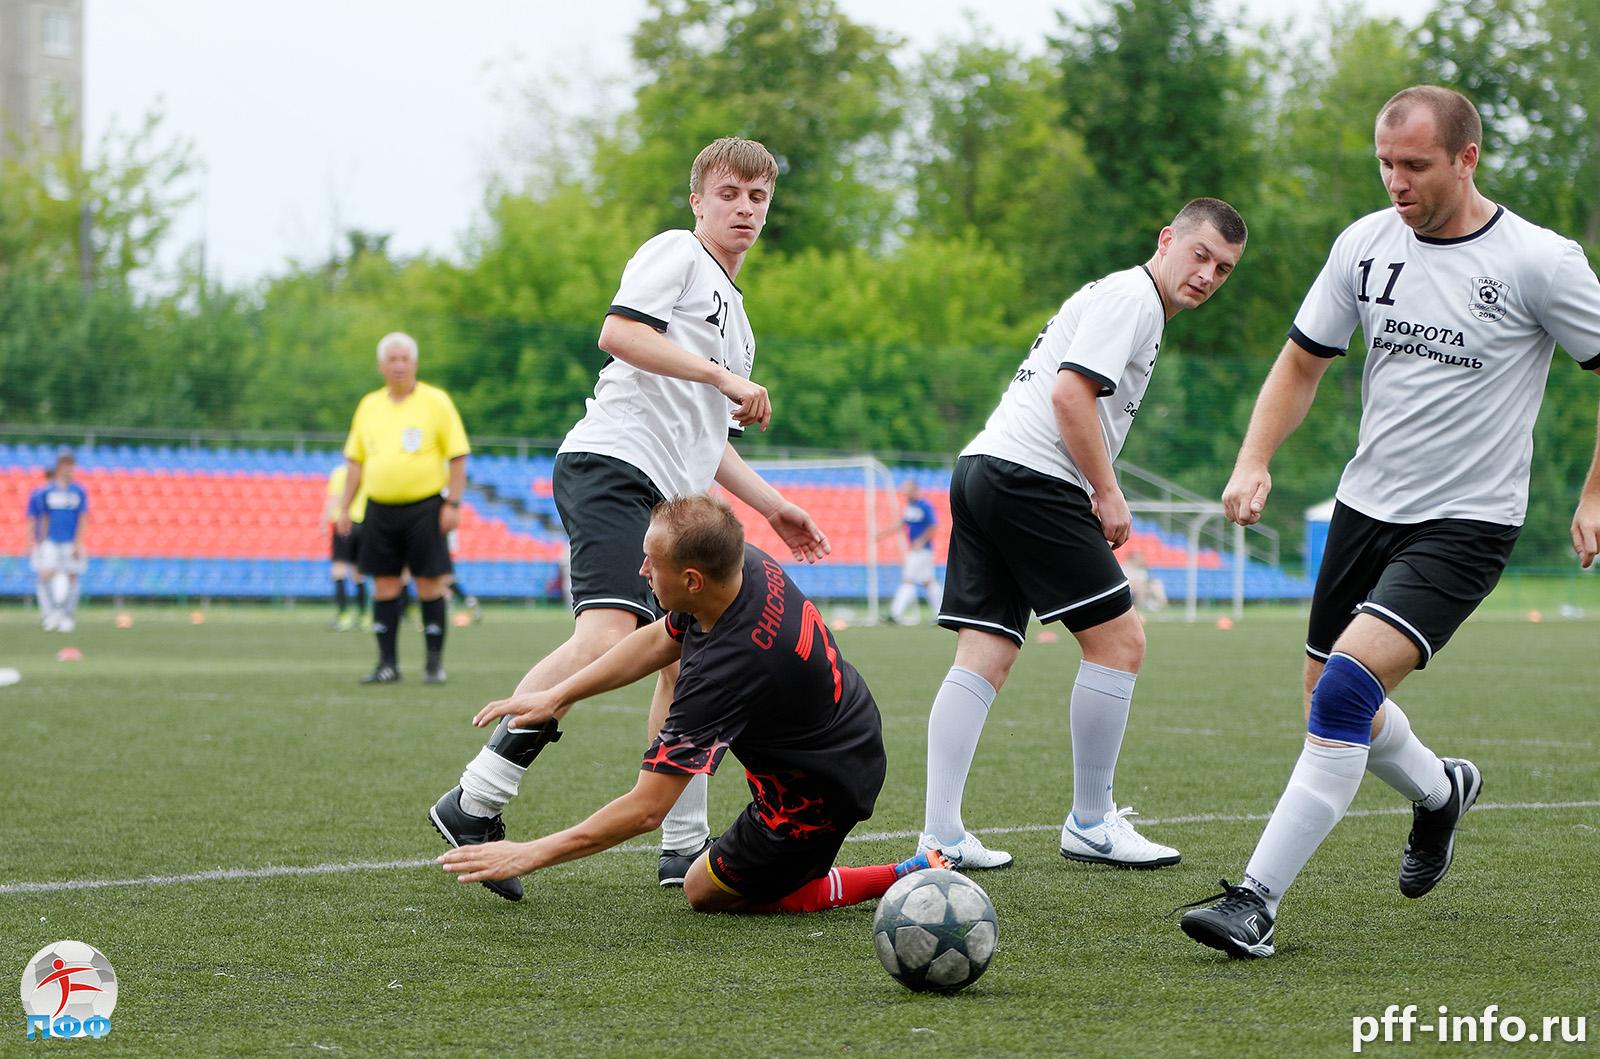 Премьер-лига ТДК. 8 тур. Матч тура